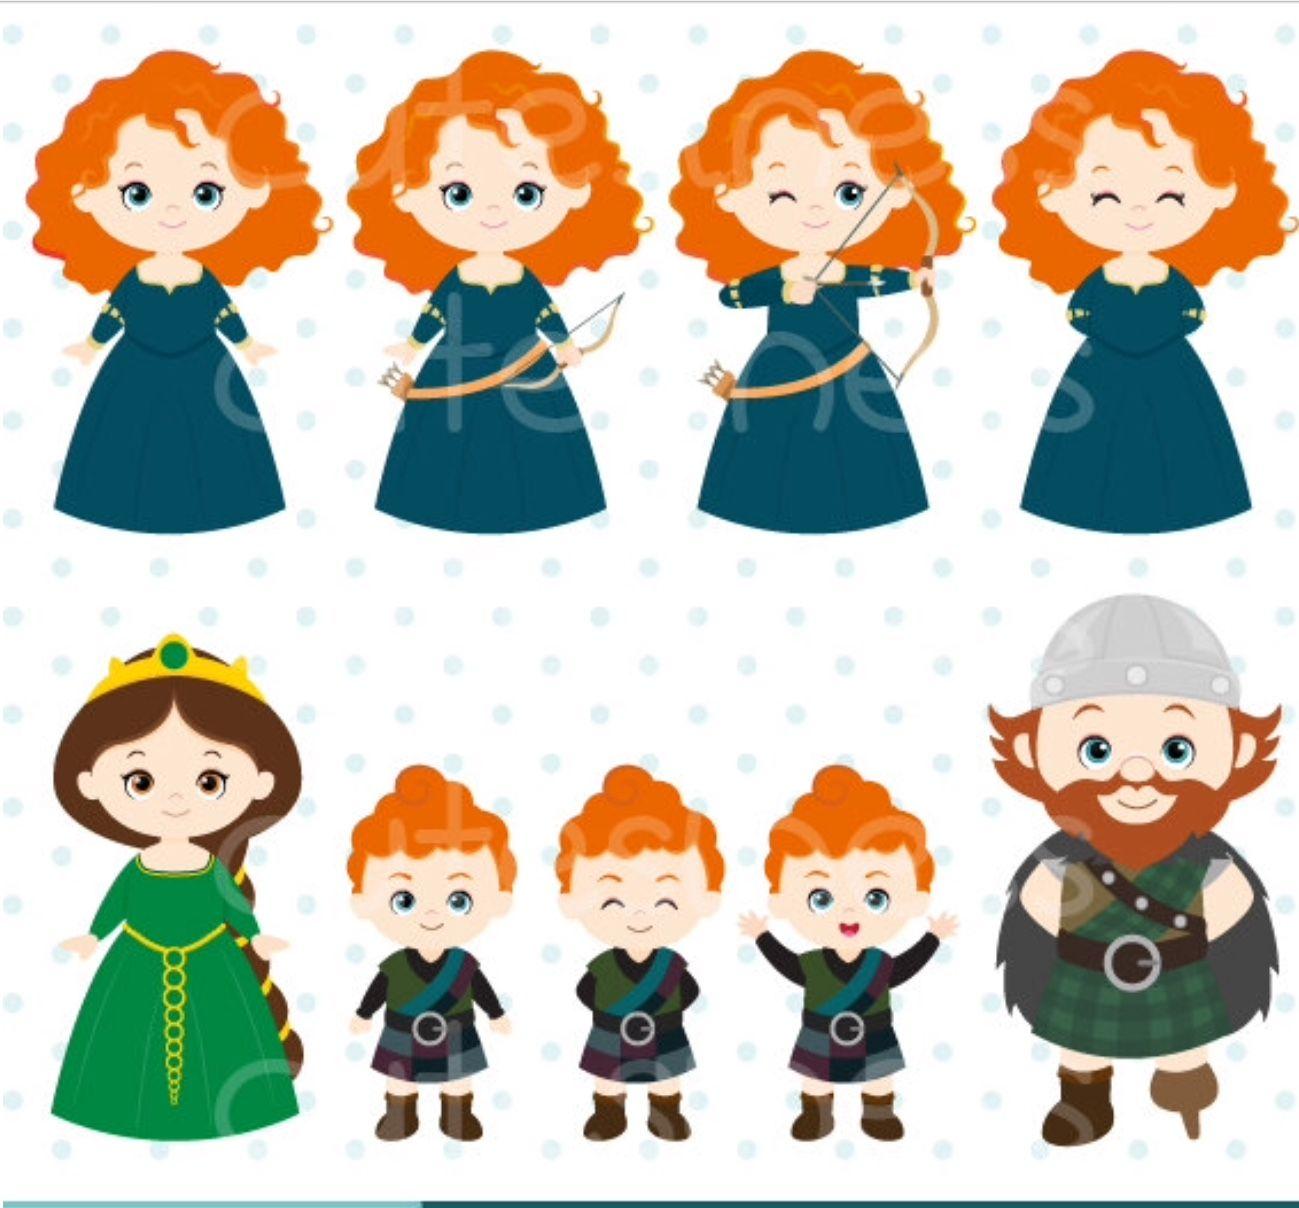 Pin De Delicada Art Em Disney Clip Art Merida Valente Contacao De Historia Infantil Disney Fofa